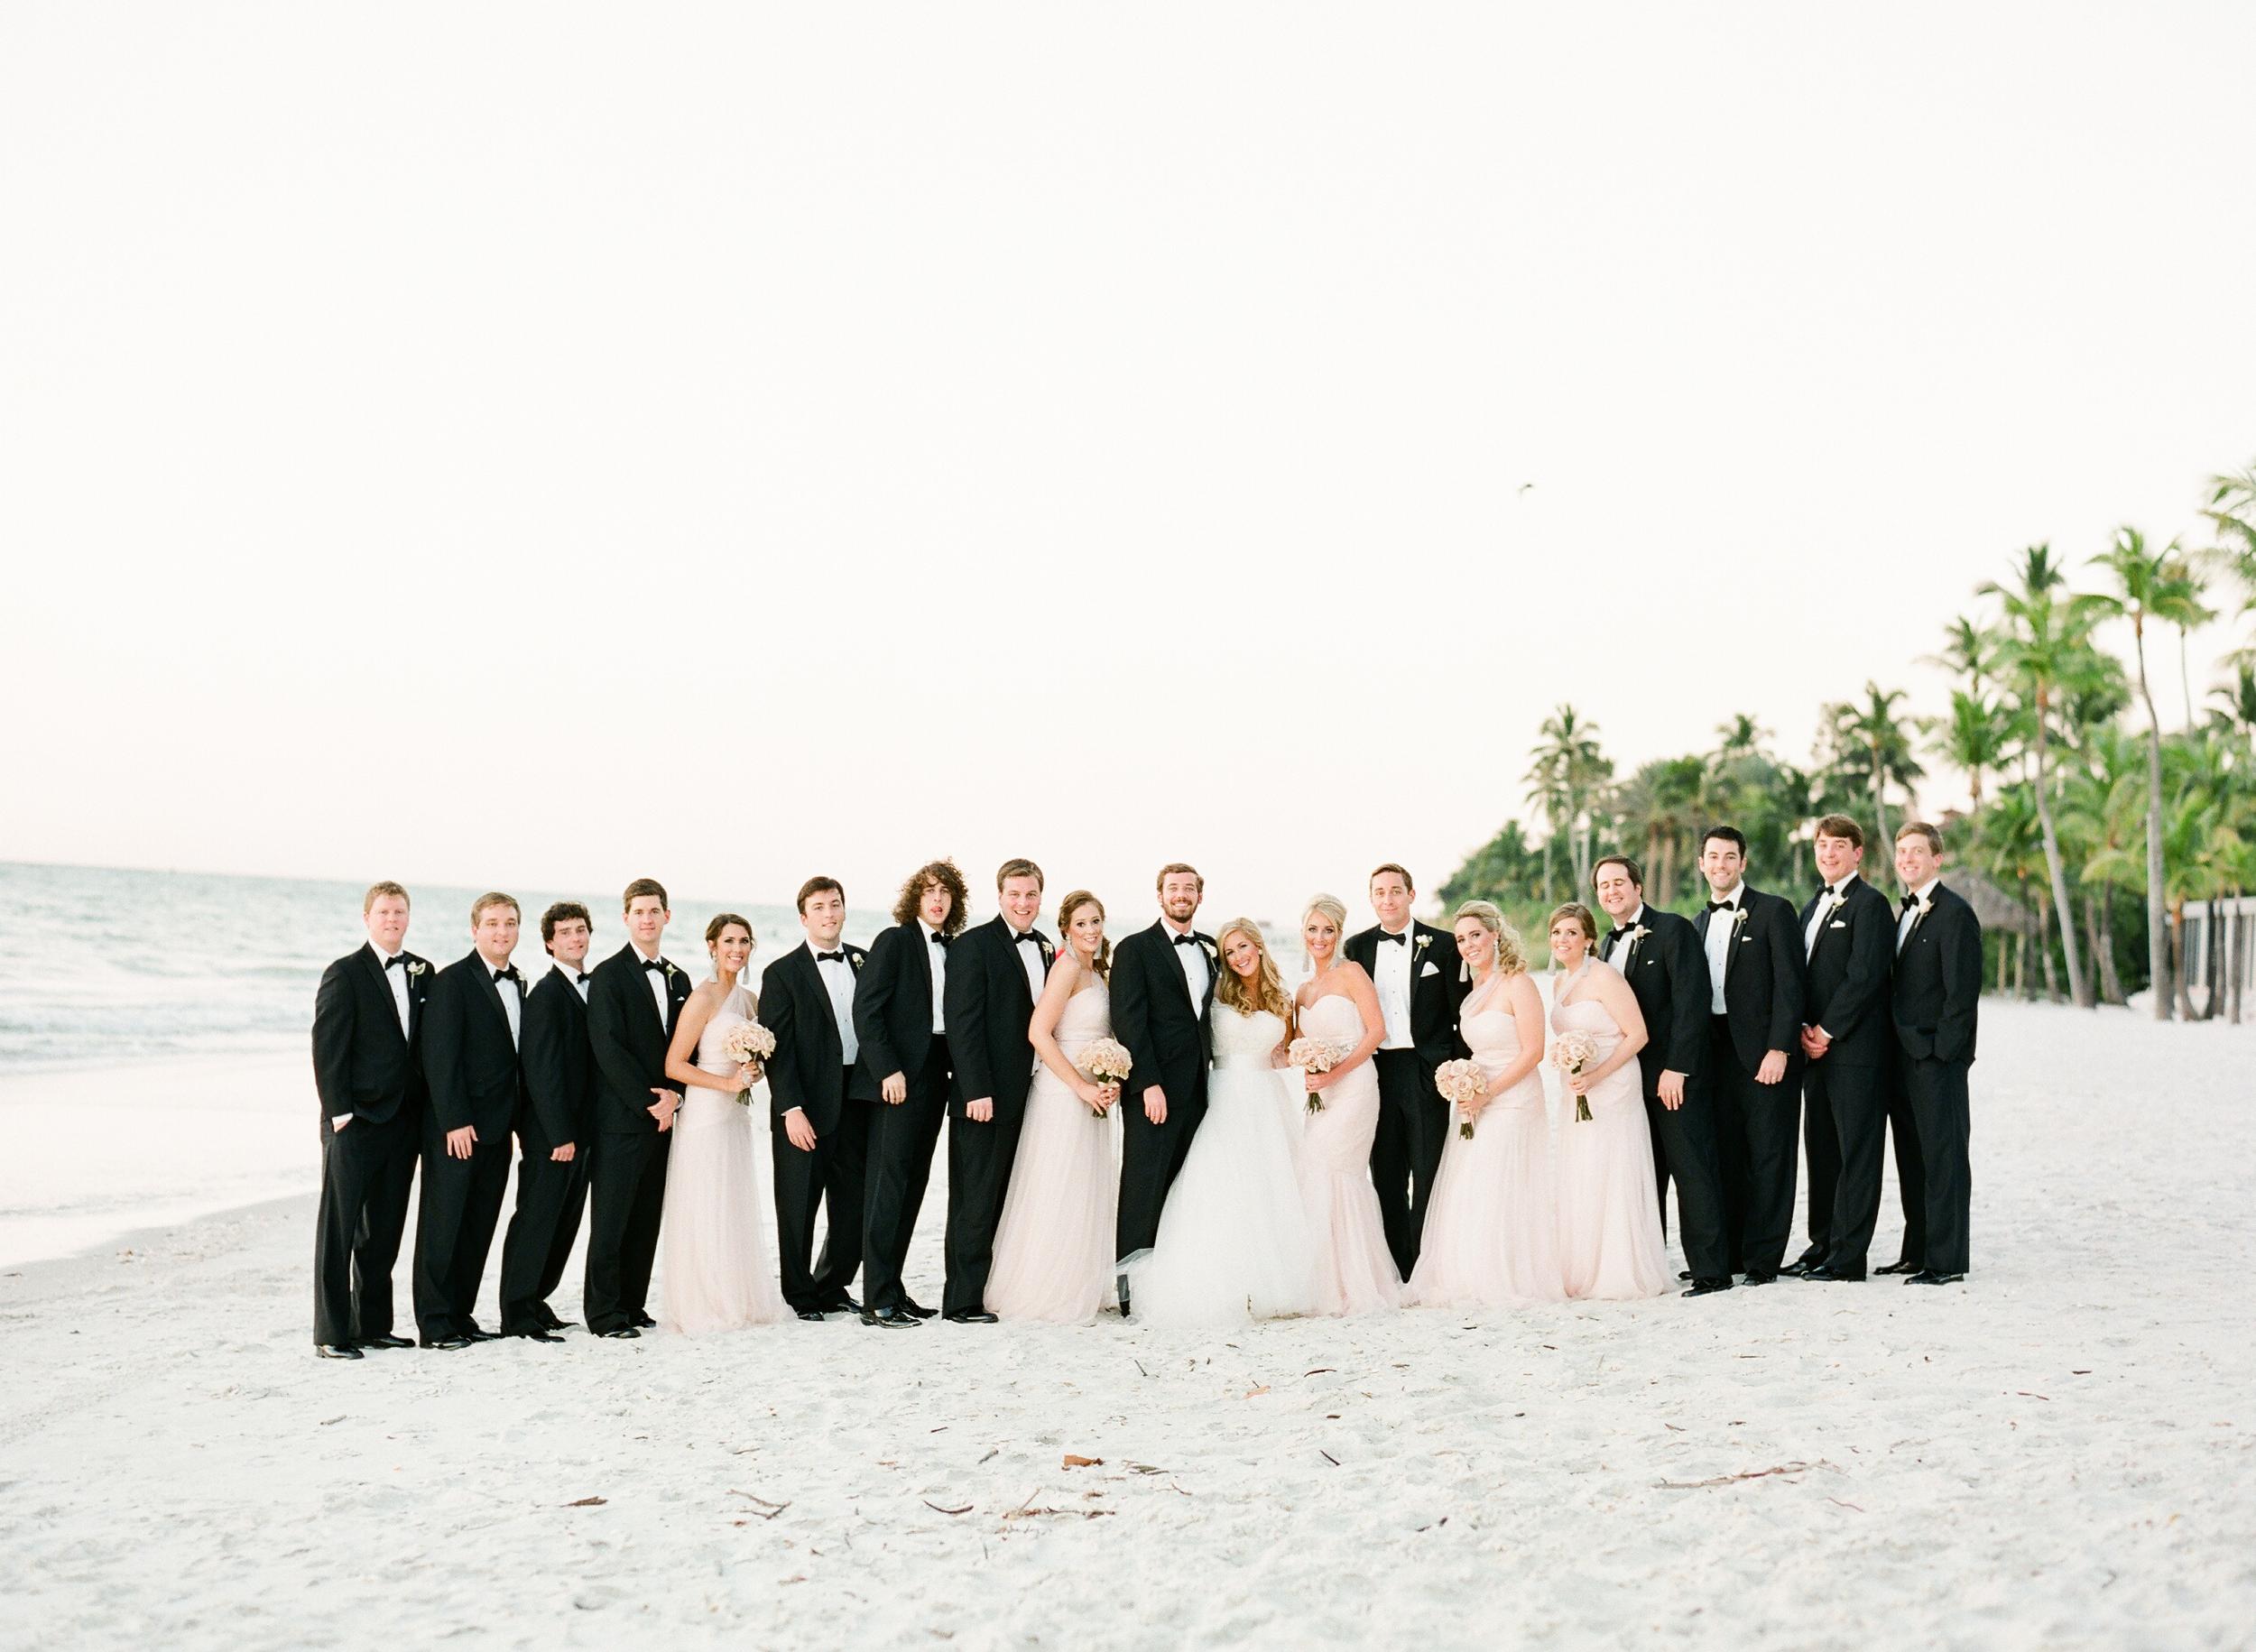 Ceci_New_York_Florida_Wedding_Style_Bride_Watercolor_Real_Custom_Luxury_89.jpg